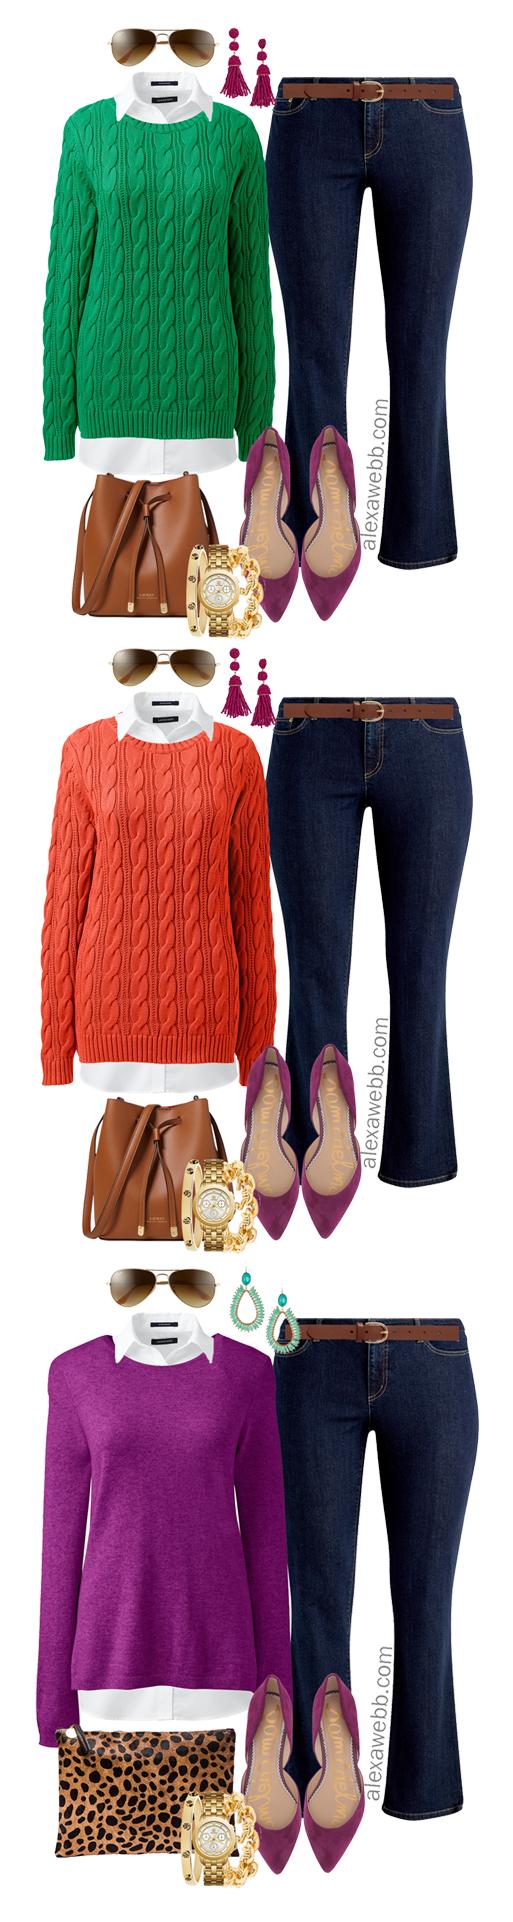 Plus Size Bright Sweater Outfit Ideas - Plus Size Fall and Winter Outfits - Plus Size Fashion for Women - alexawebb.com #alexawebb #plussize